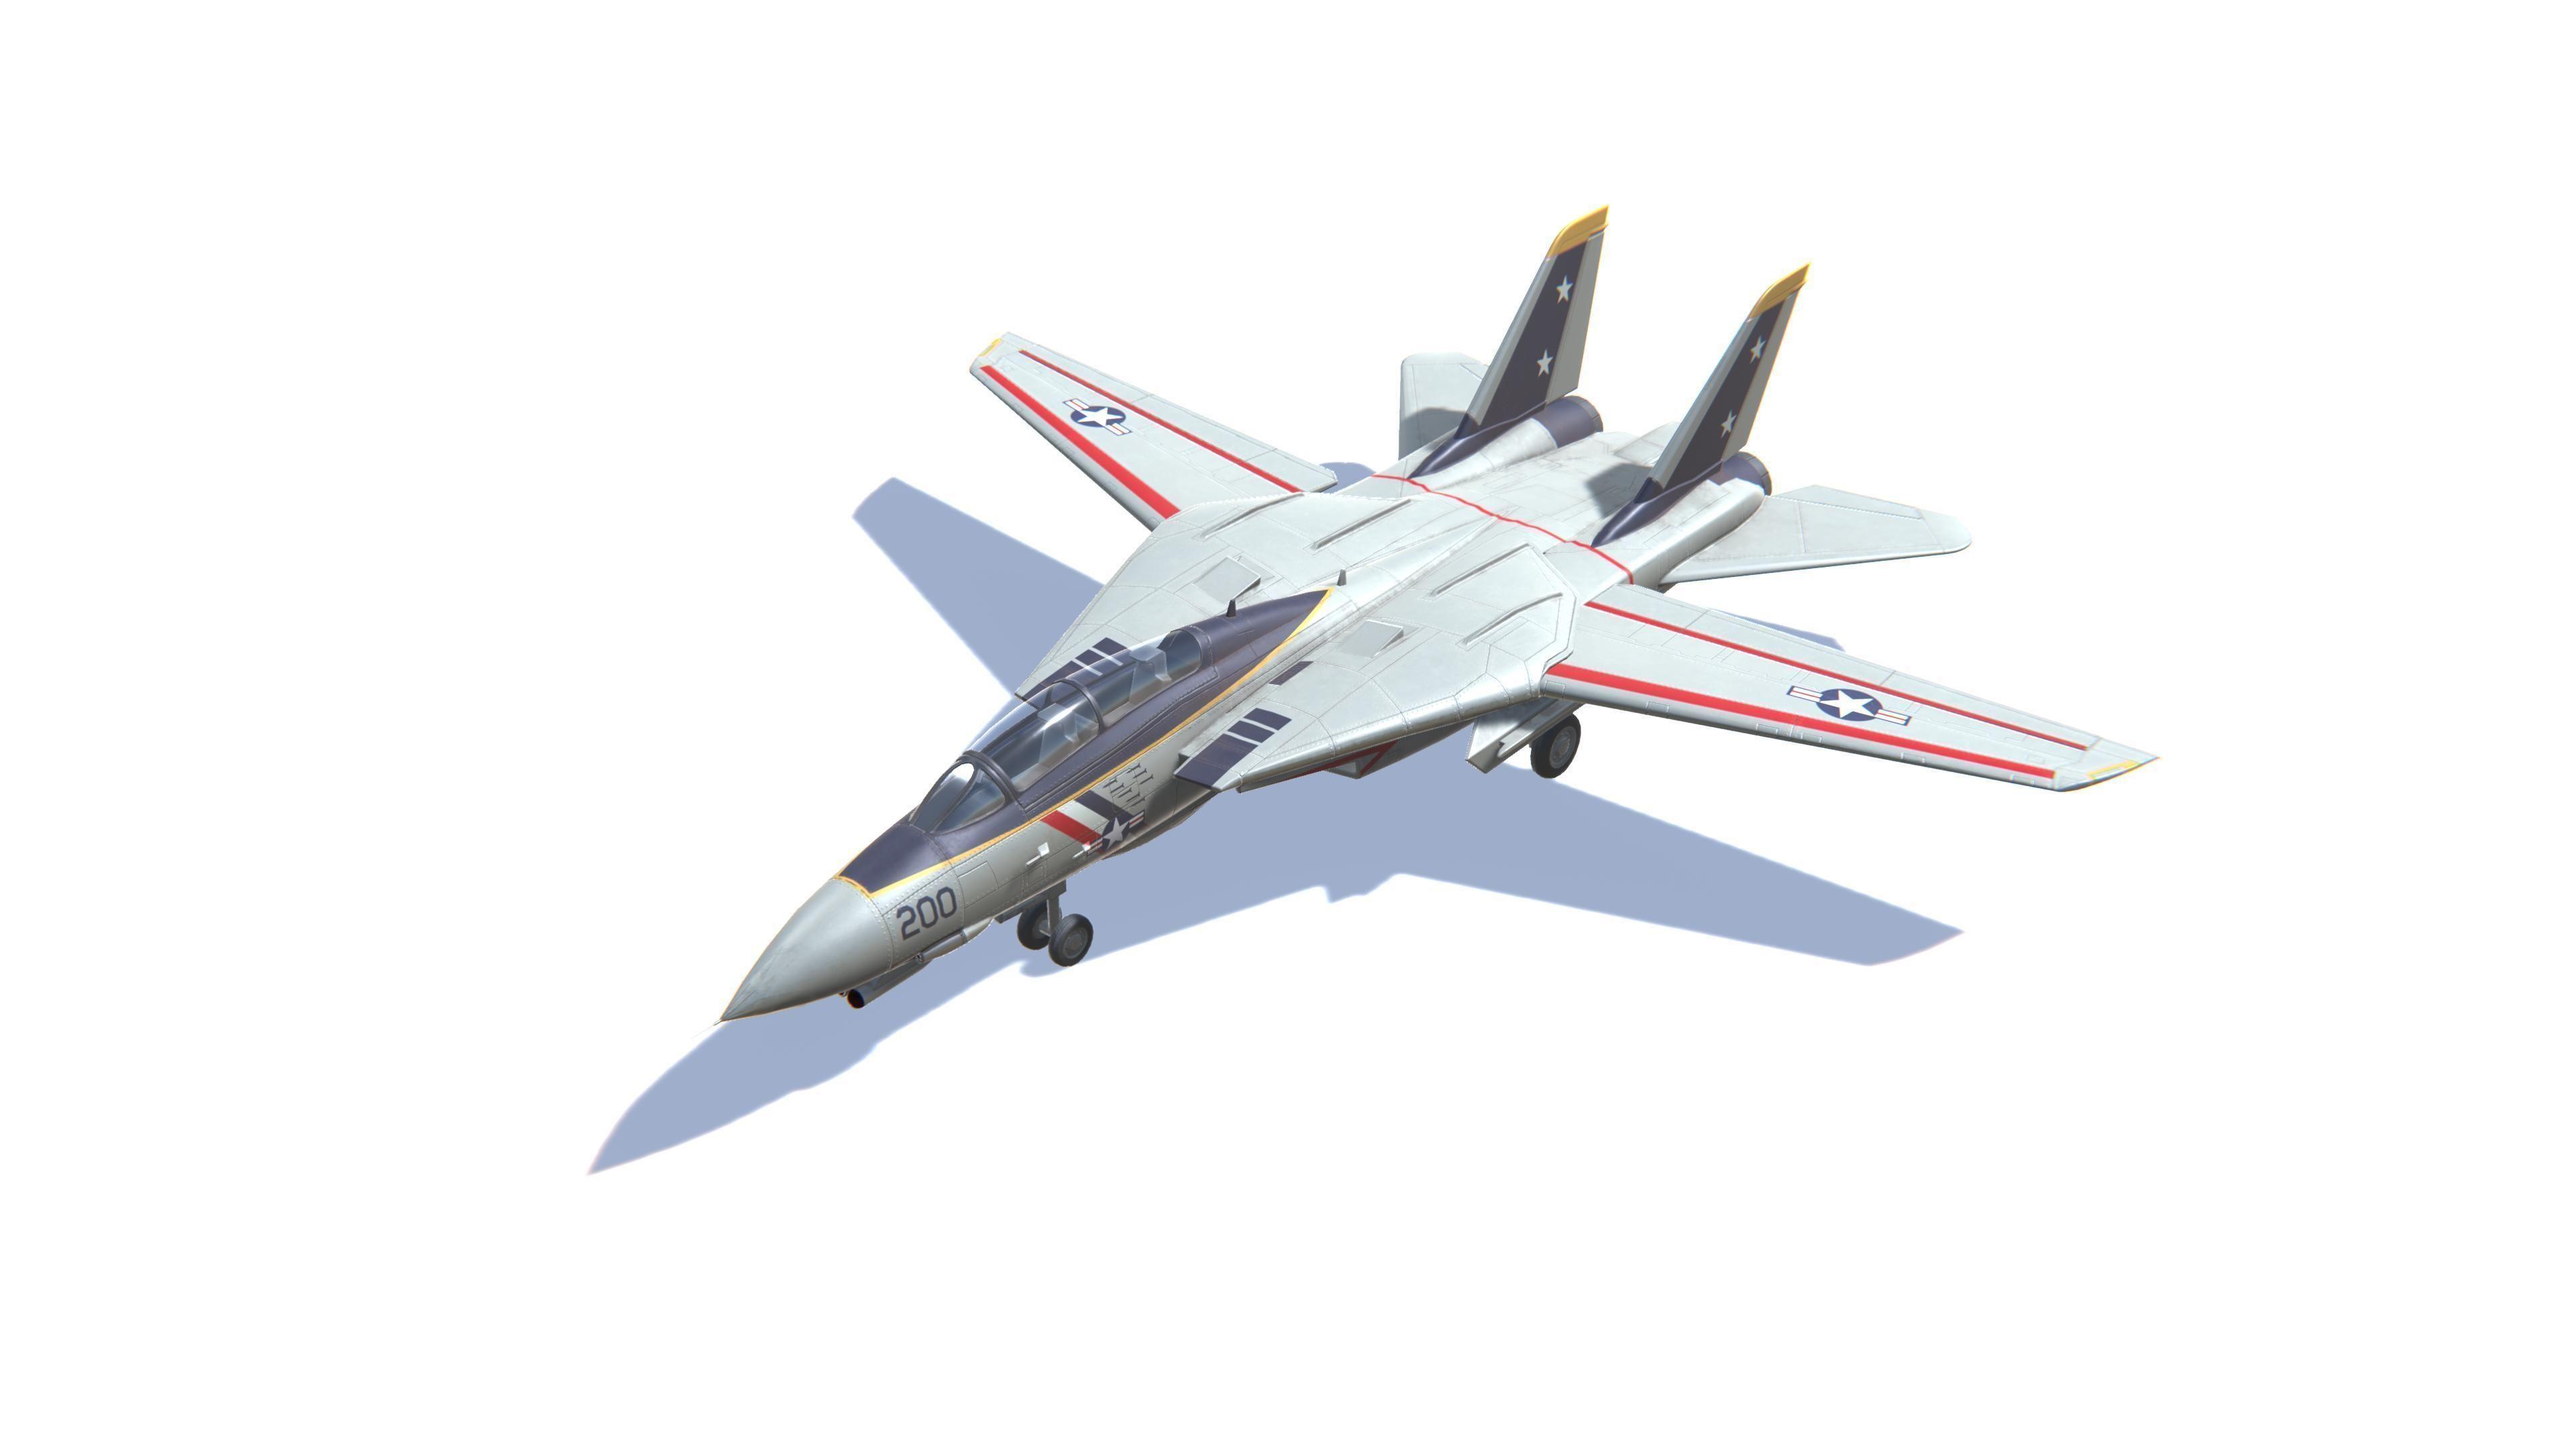 F-14 Tomcat Jet Fighter Aircraft